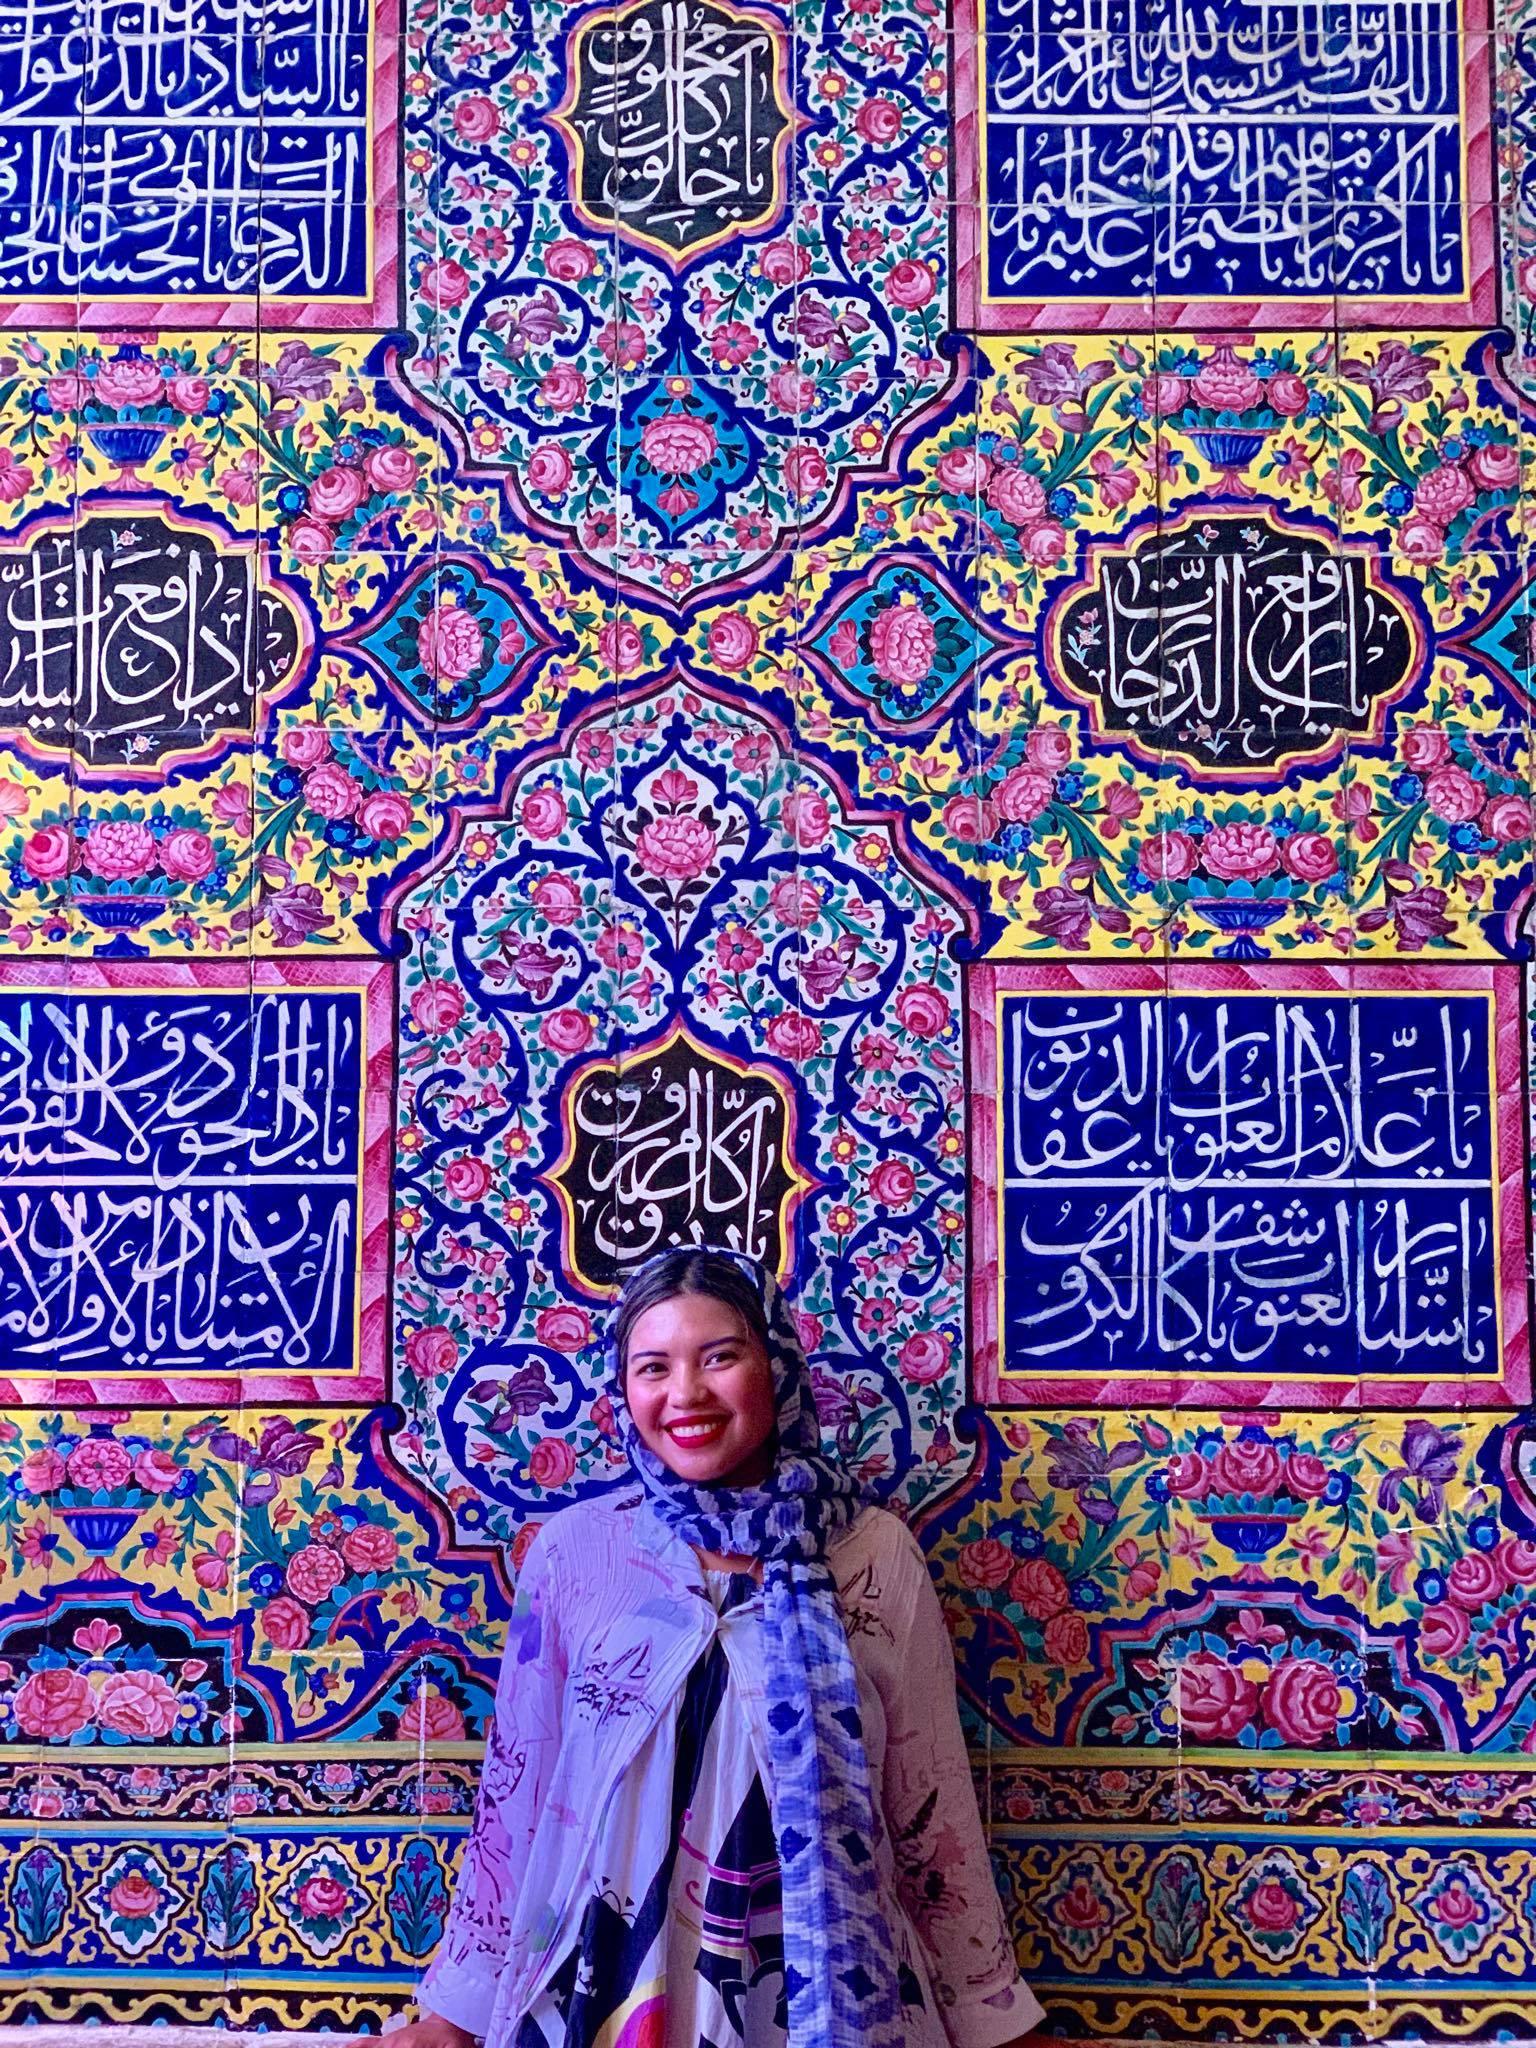 Kach Solo Travels in 2019 Good morning from SHIRAZ, IRAN1.jpg